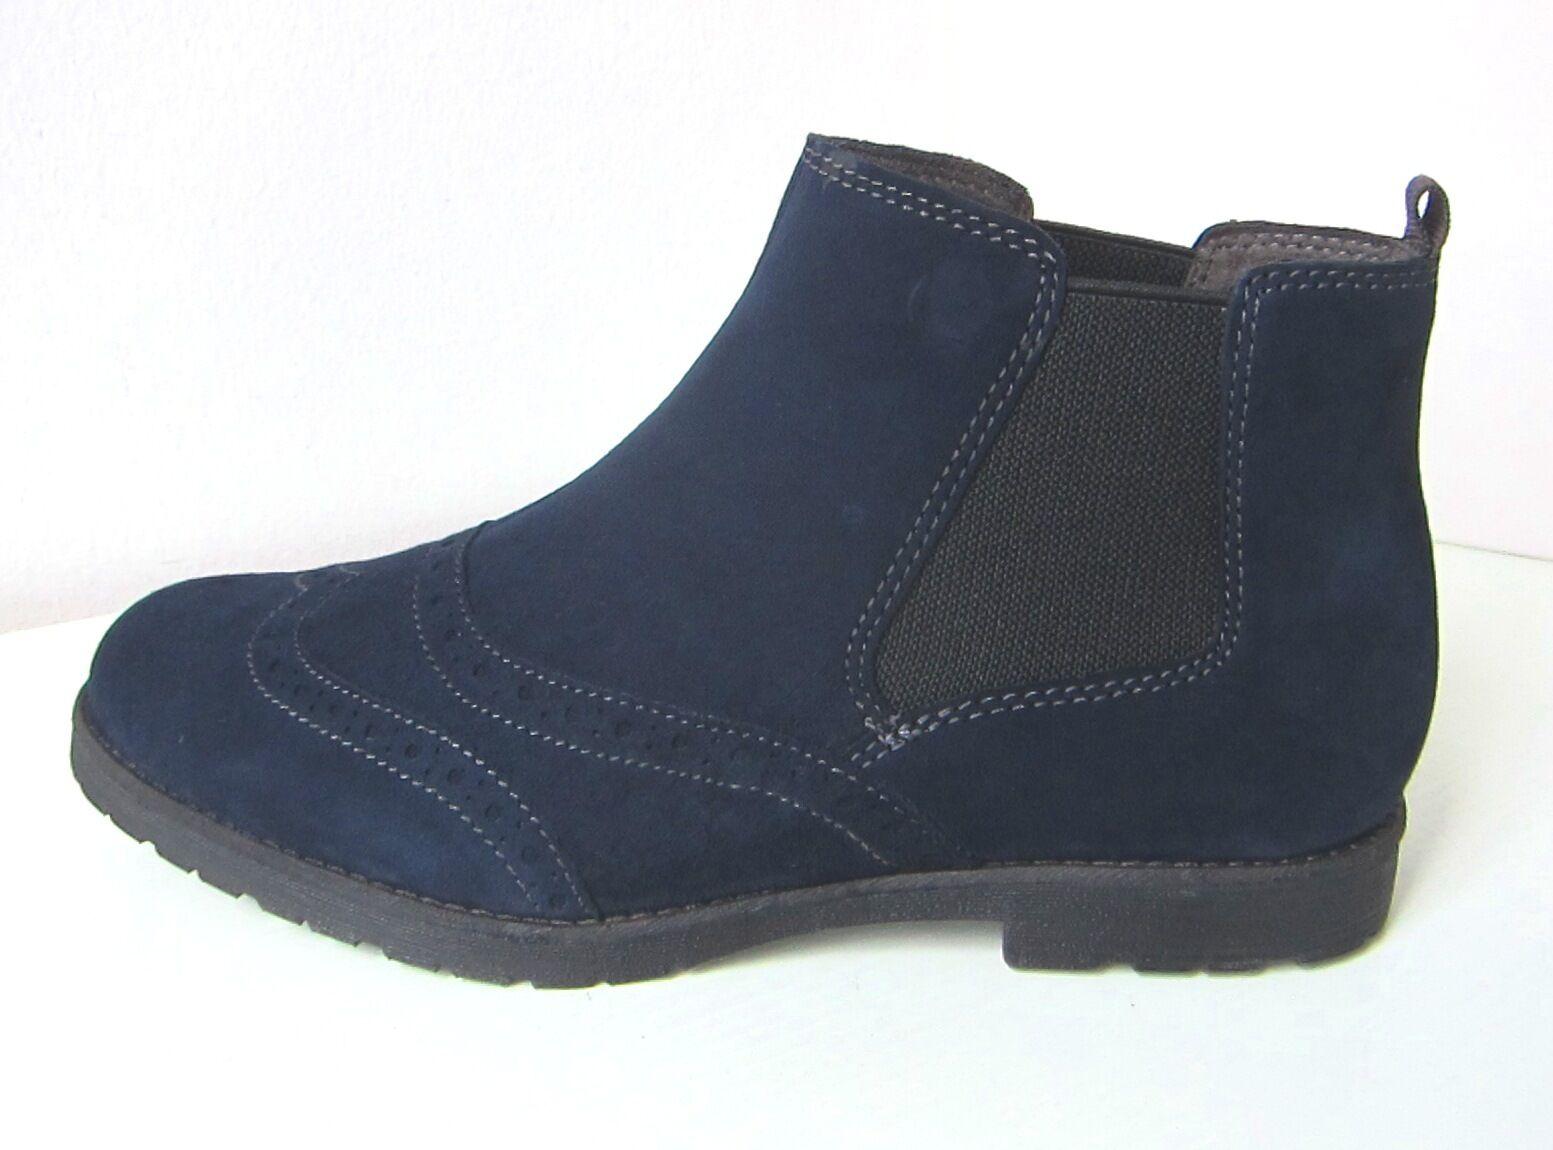 Tamaris serraje botas botín azul talla 40 botines botaee azul Suede